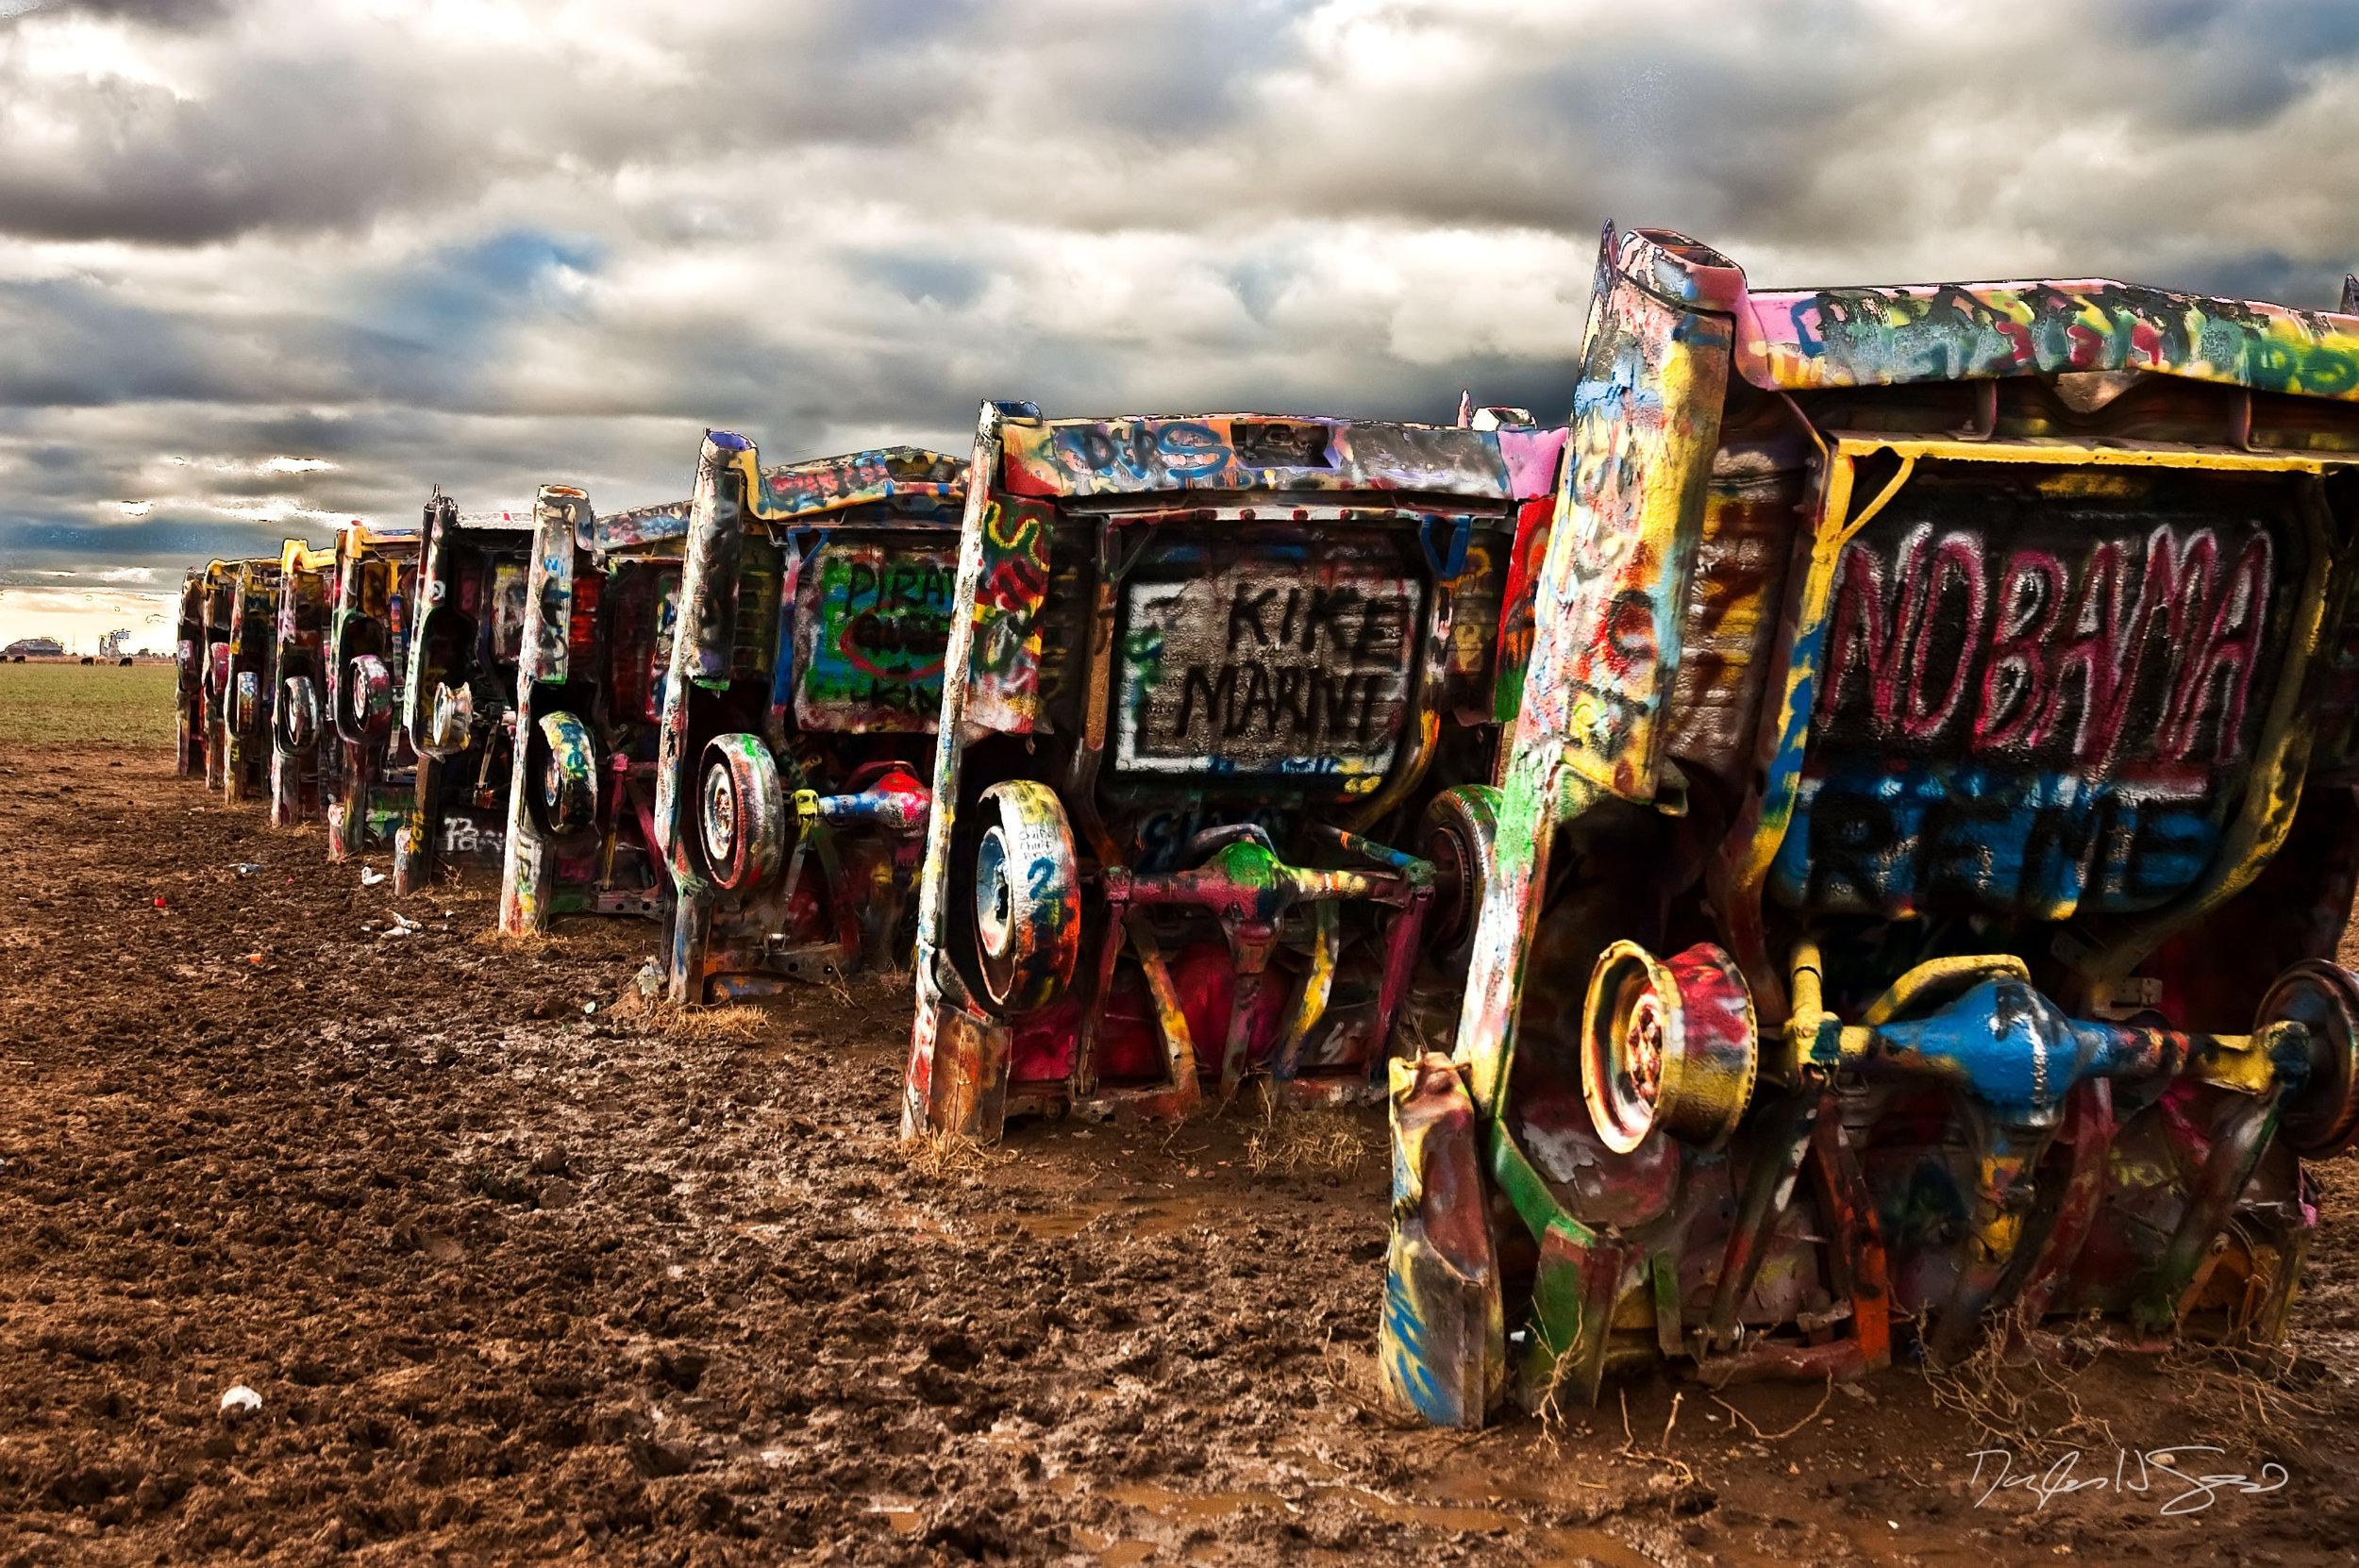 cadillac ranch amarillo texas doug graybeal photography usd